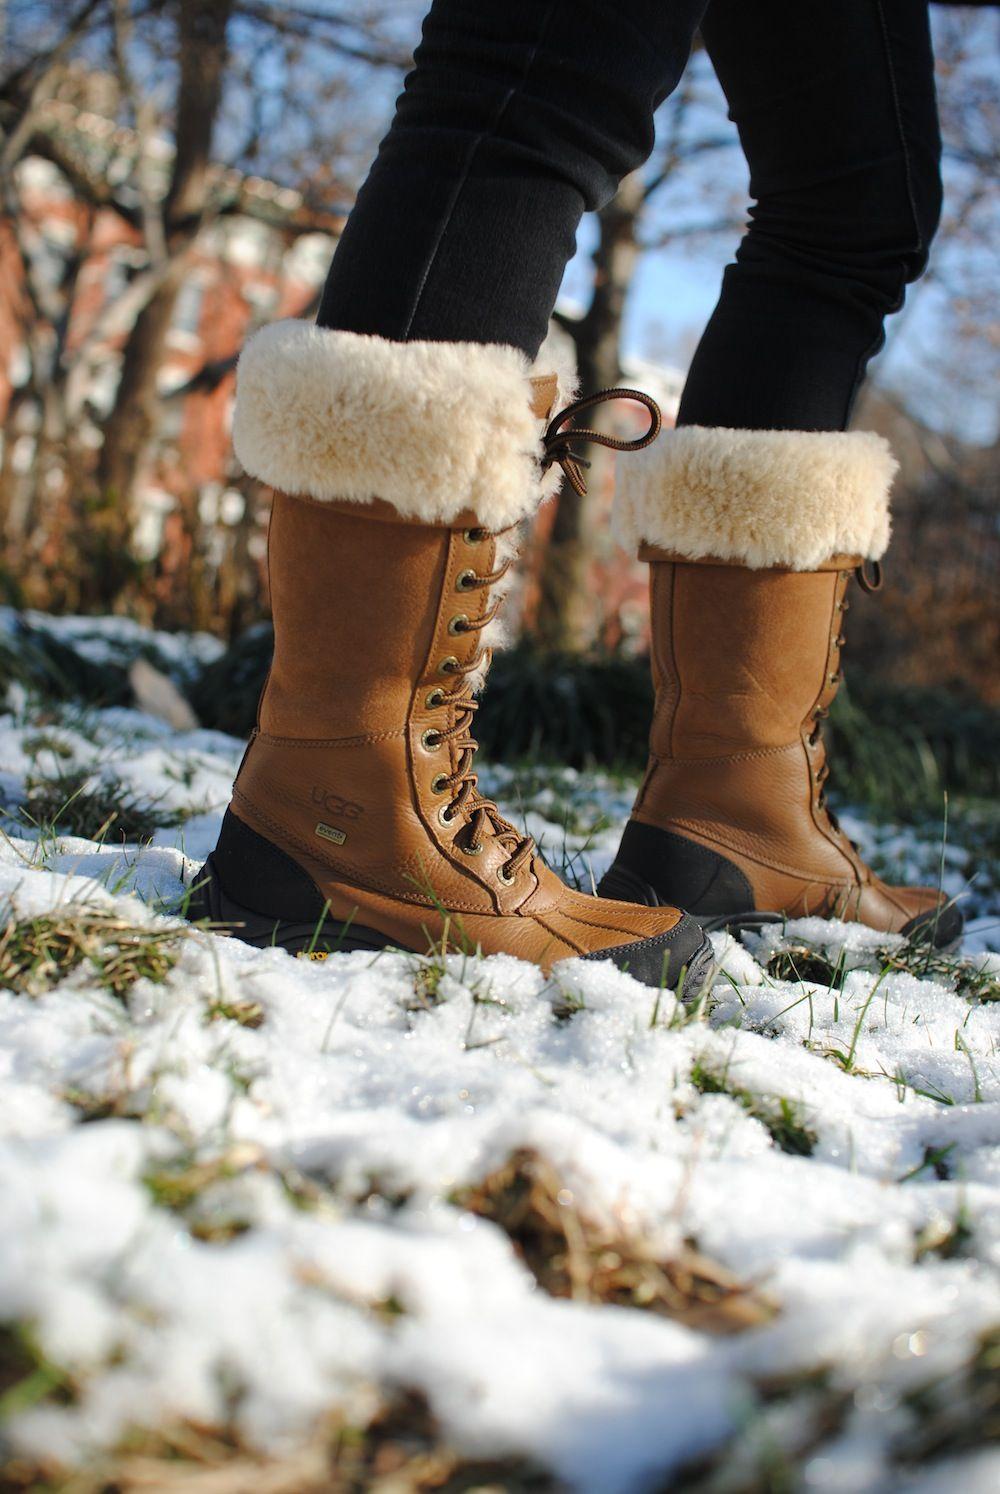 ba665277bee UGG Australia's waterproof full-grain leather sheepskin snow boot ...